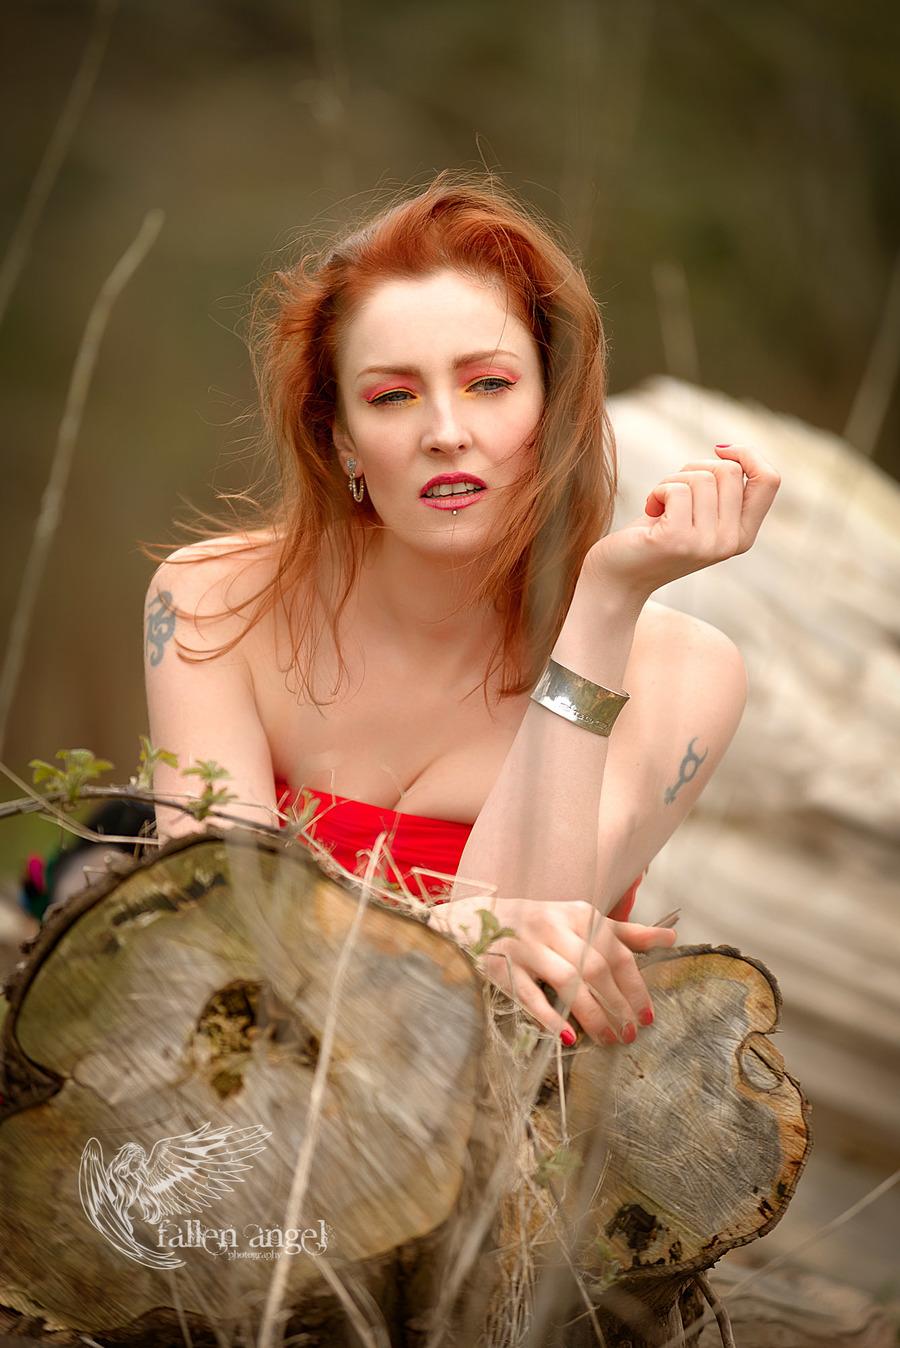 Photography by Fallen Angel Photography, Model Peaches Du Jour, Makeup by Peaches Du Jour / Uploaded 5th April 2018 @ 10:48 AM